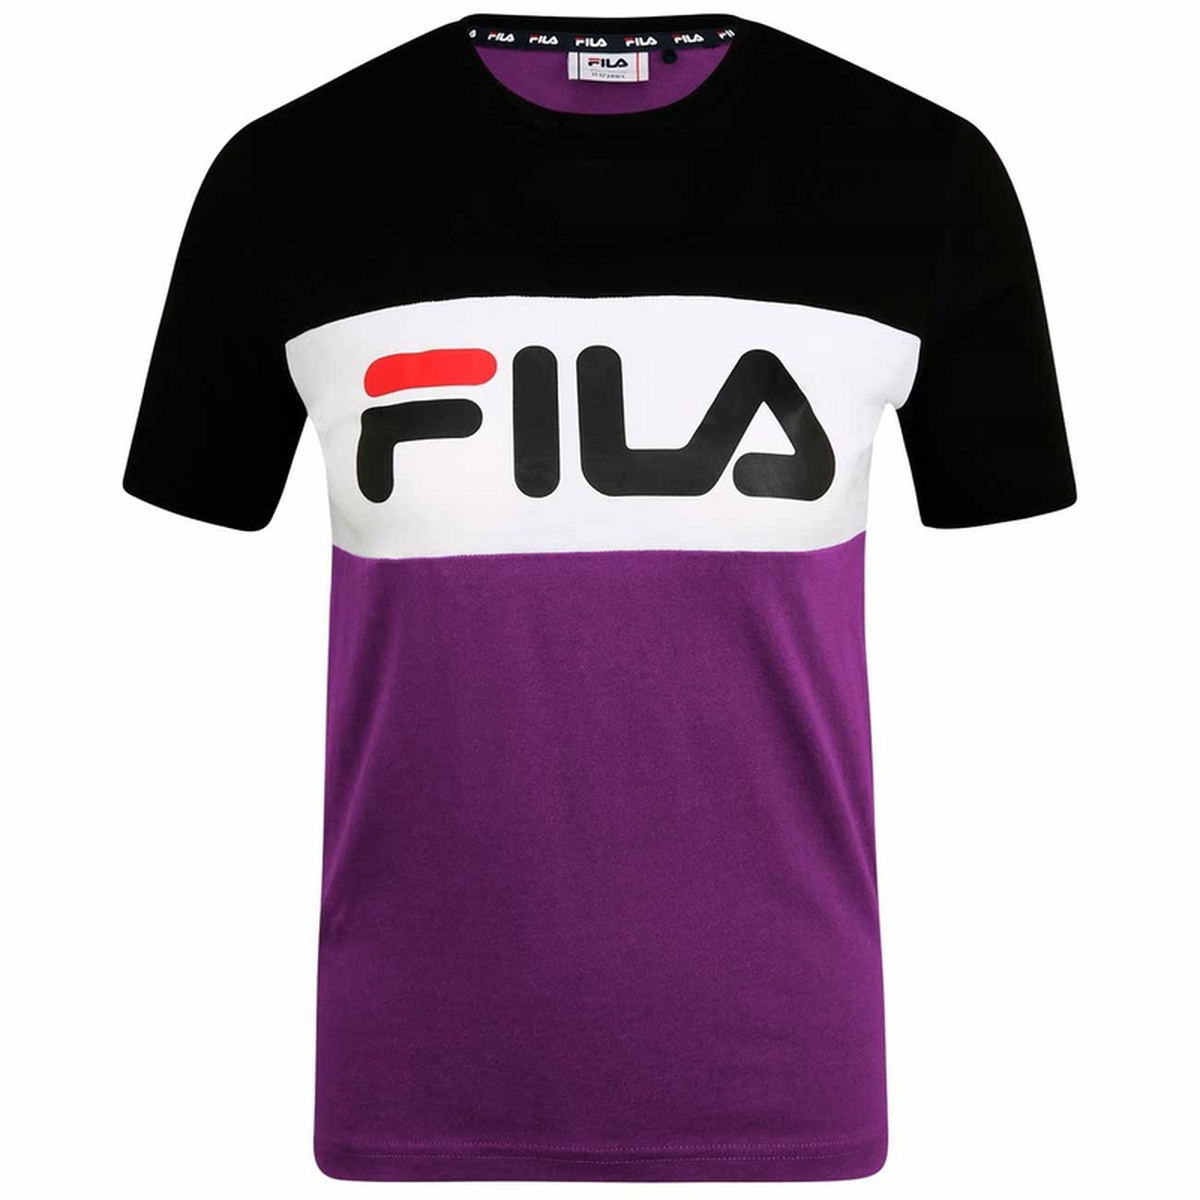 Fila - T-skjorte Teens Unisex Marina Lilla